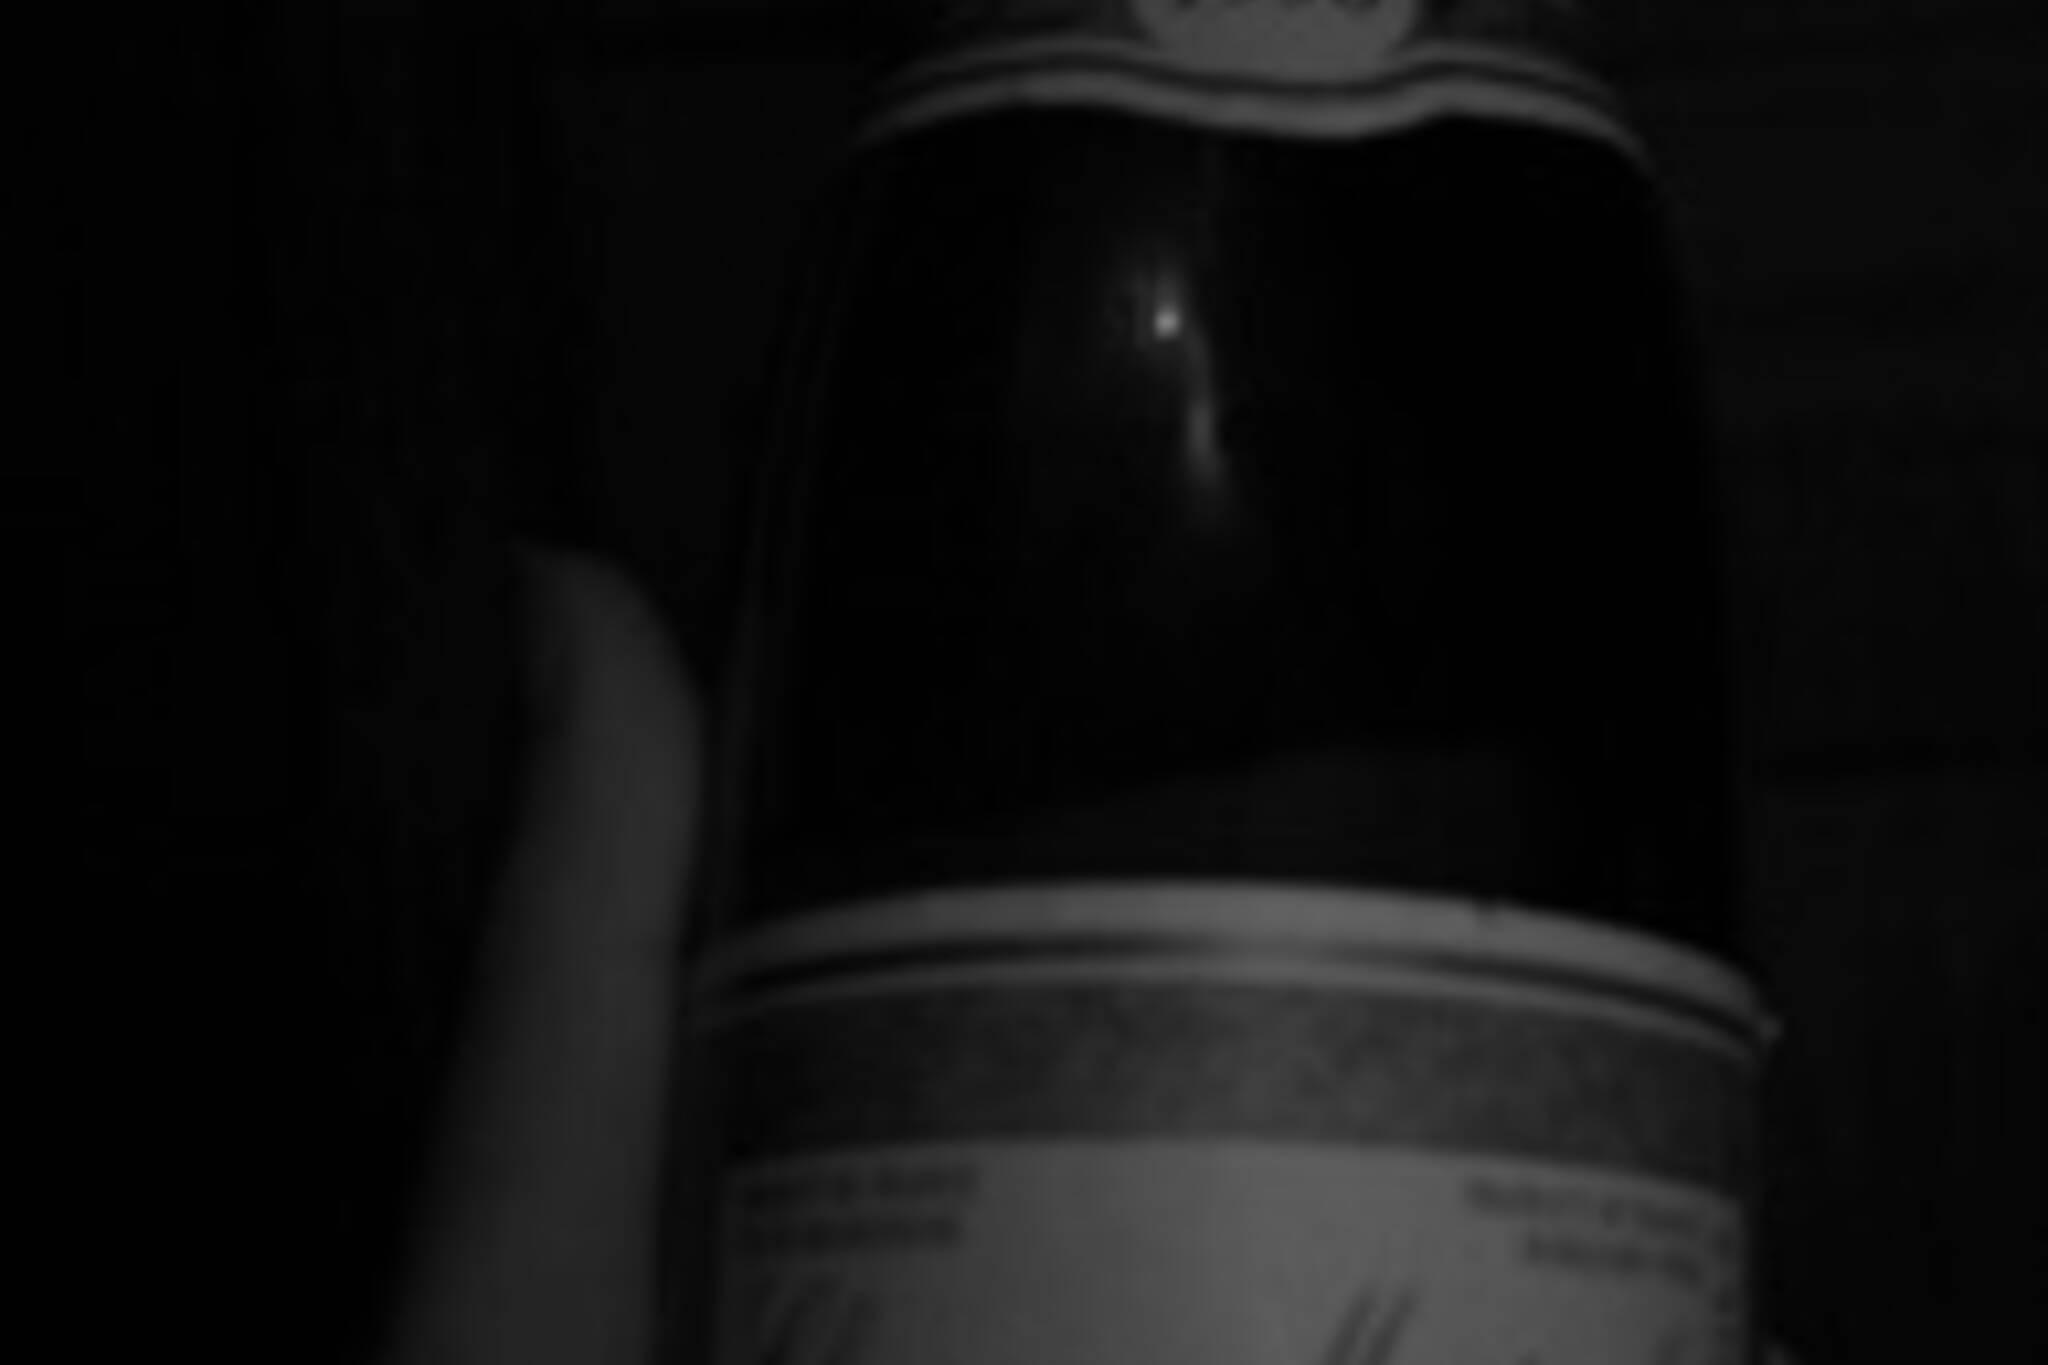 My found treasure: A bottle of Charton Trebuchet Chassagne Montrachet Premier Cru 1990